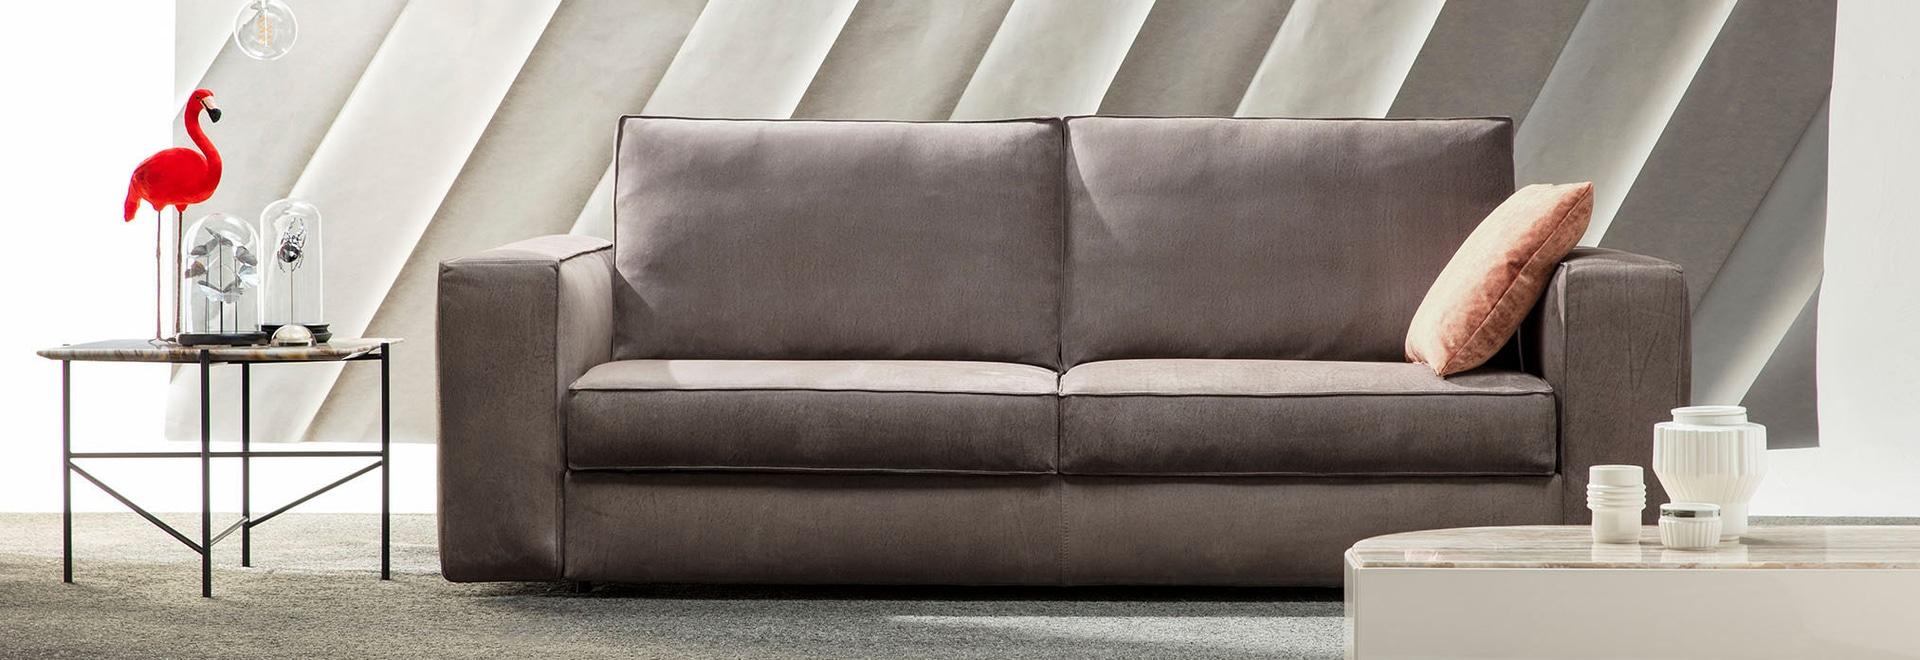 Nemo Sofa Bed